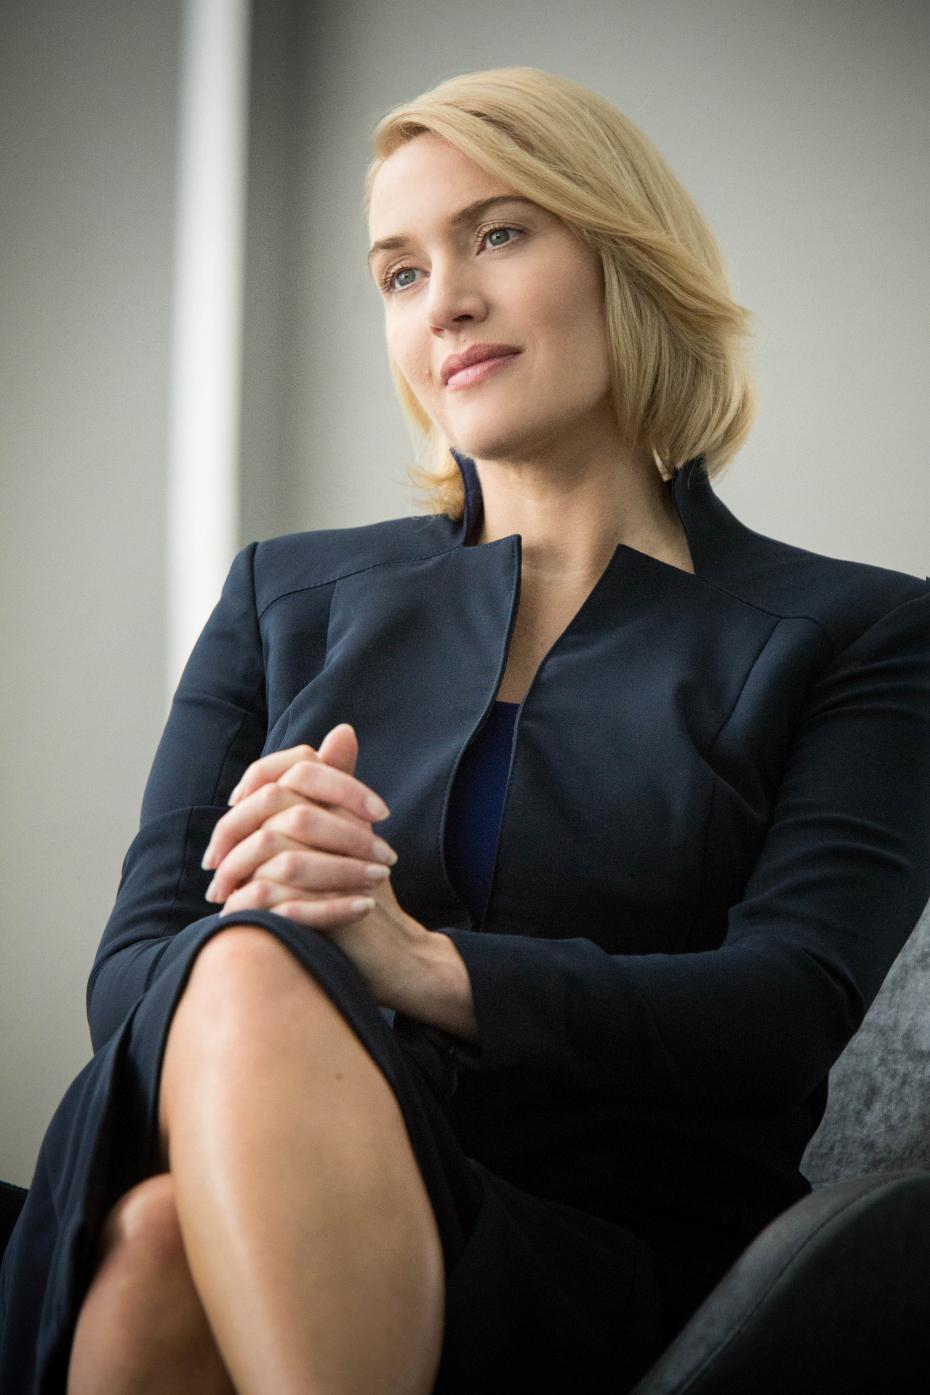 Jeanine Divergent Fichier:Jeanine.jpg - ...